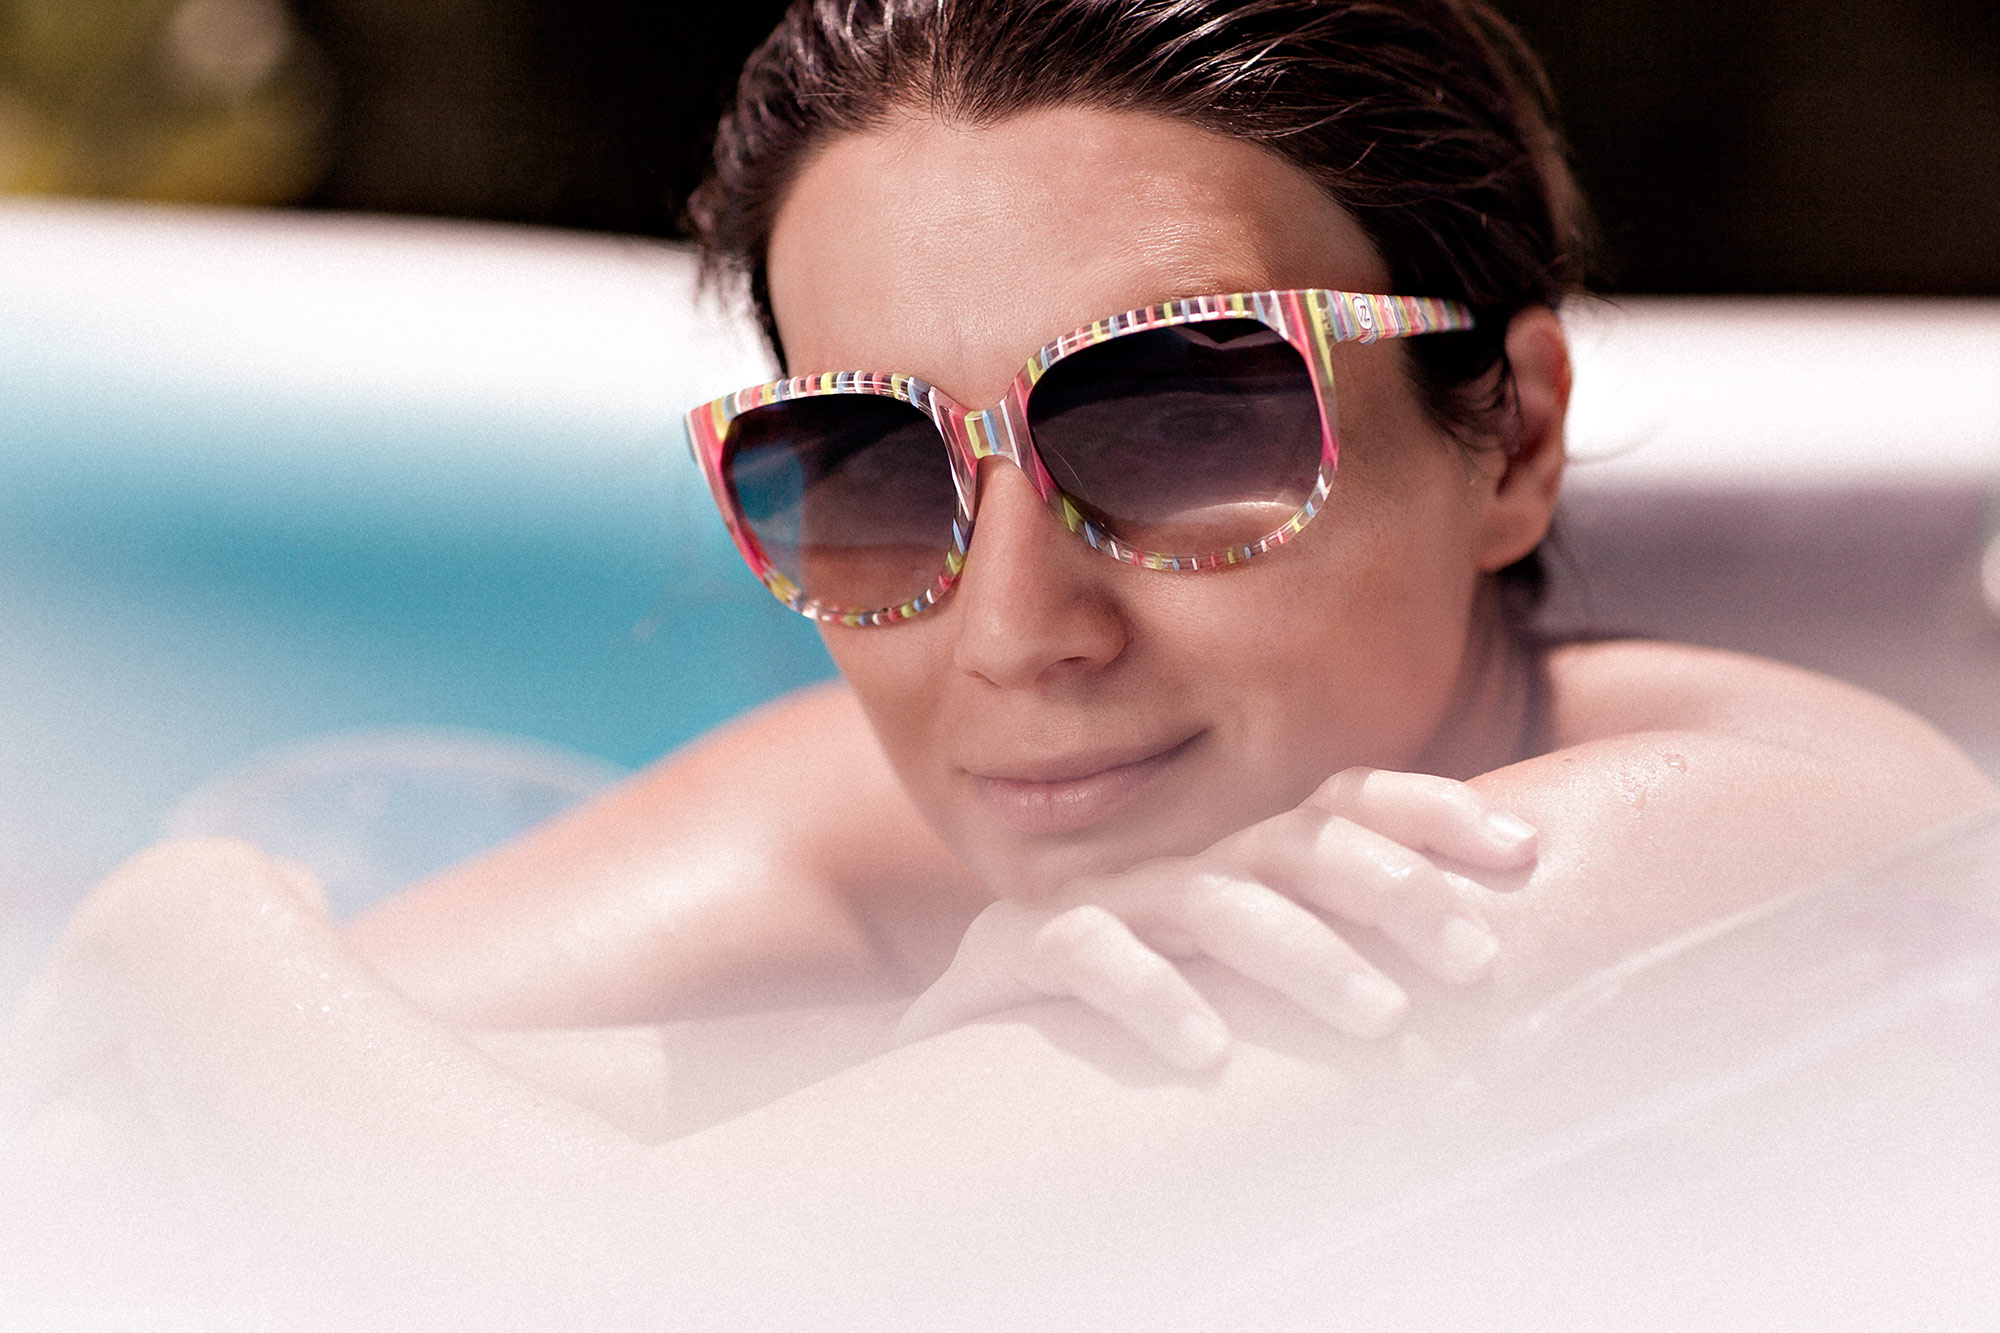 Sunglasses Portrait in Pool